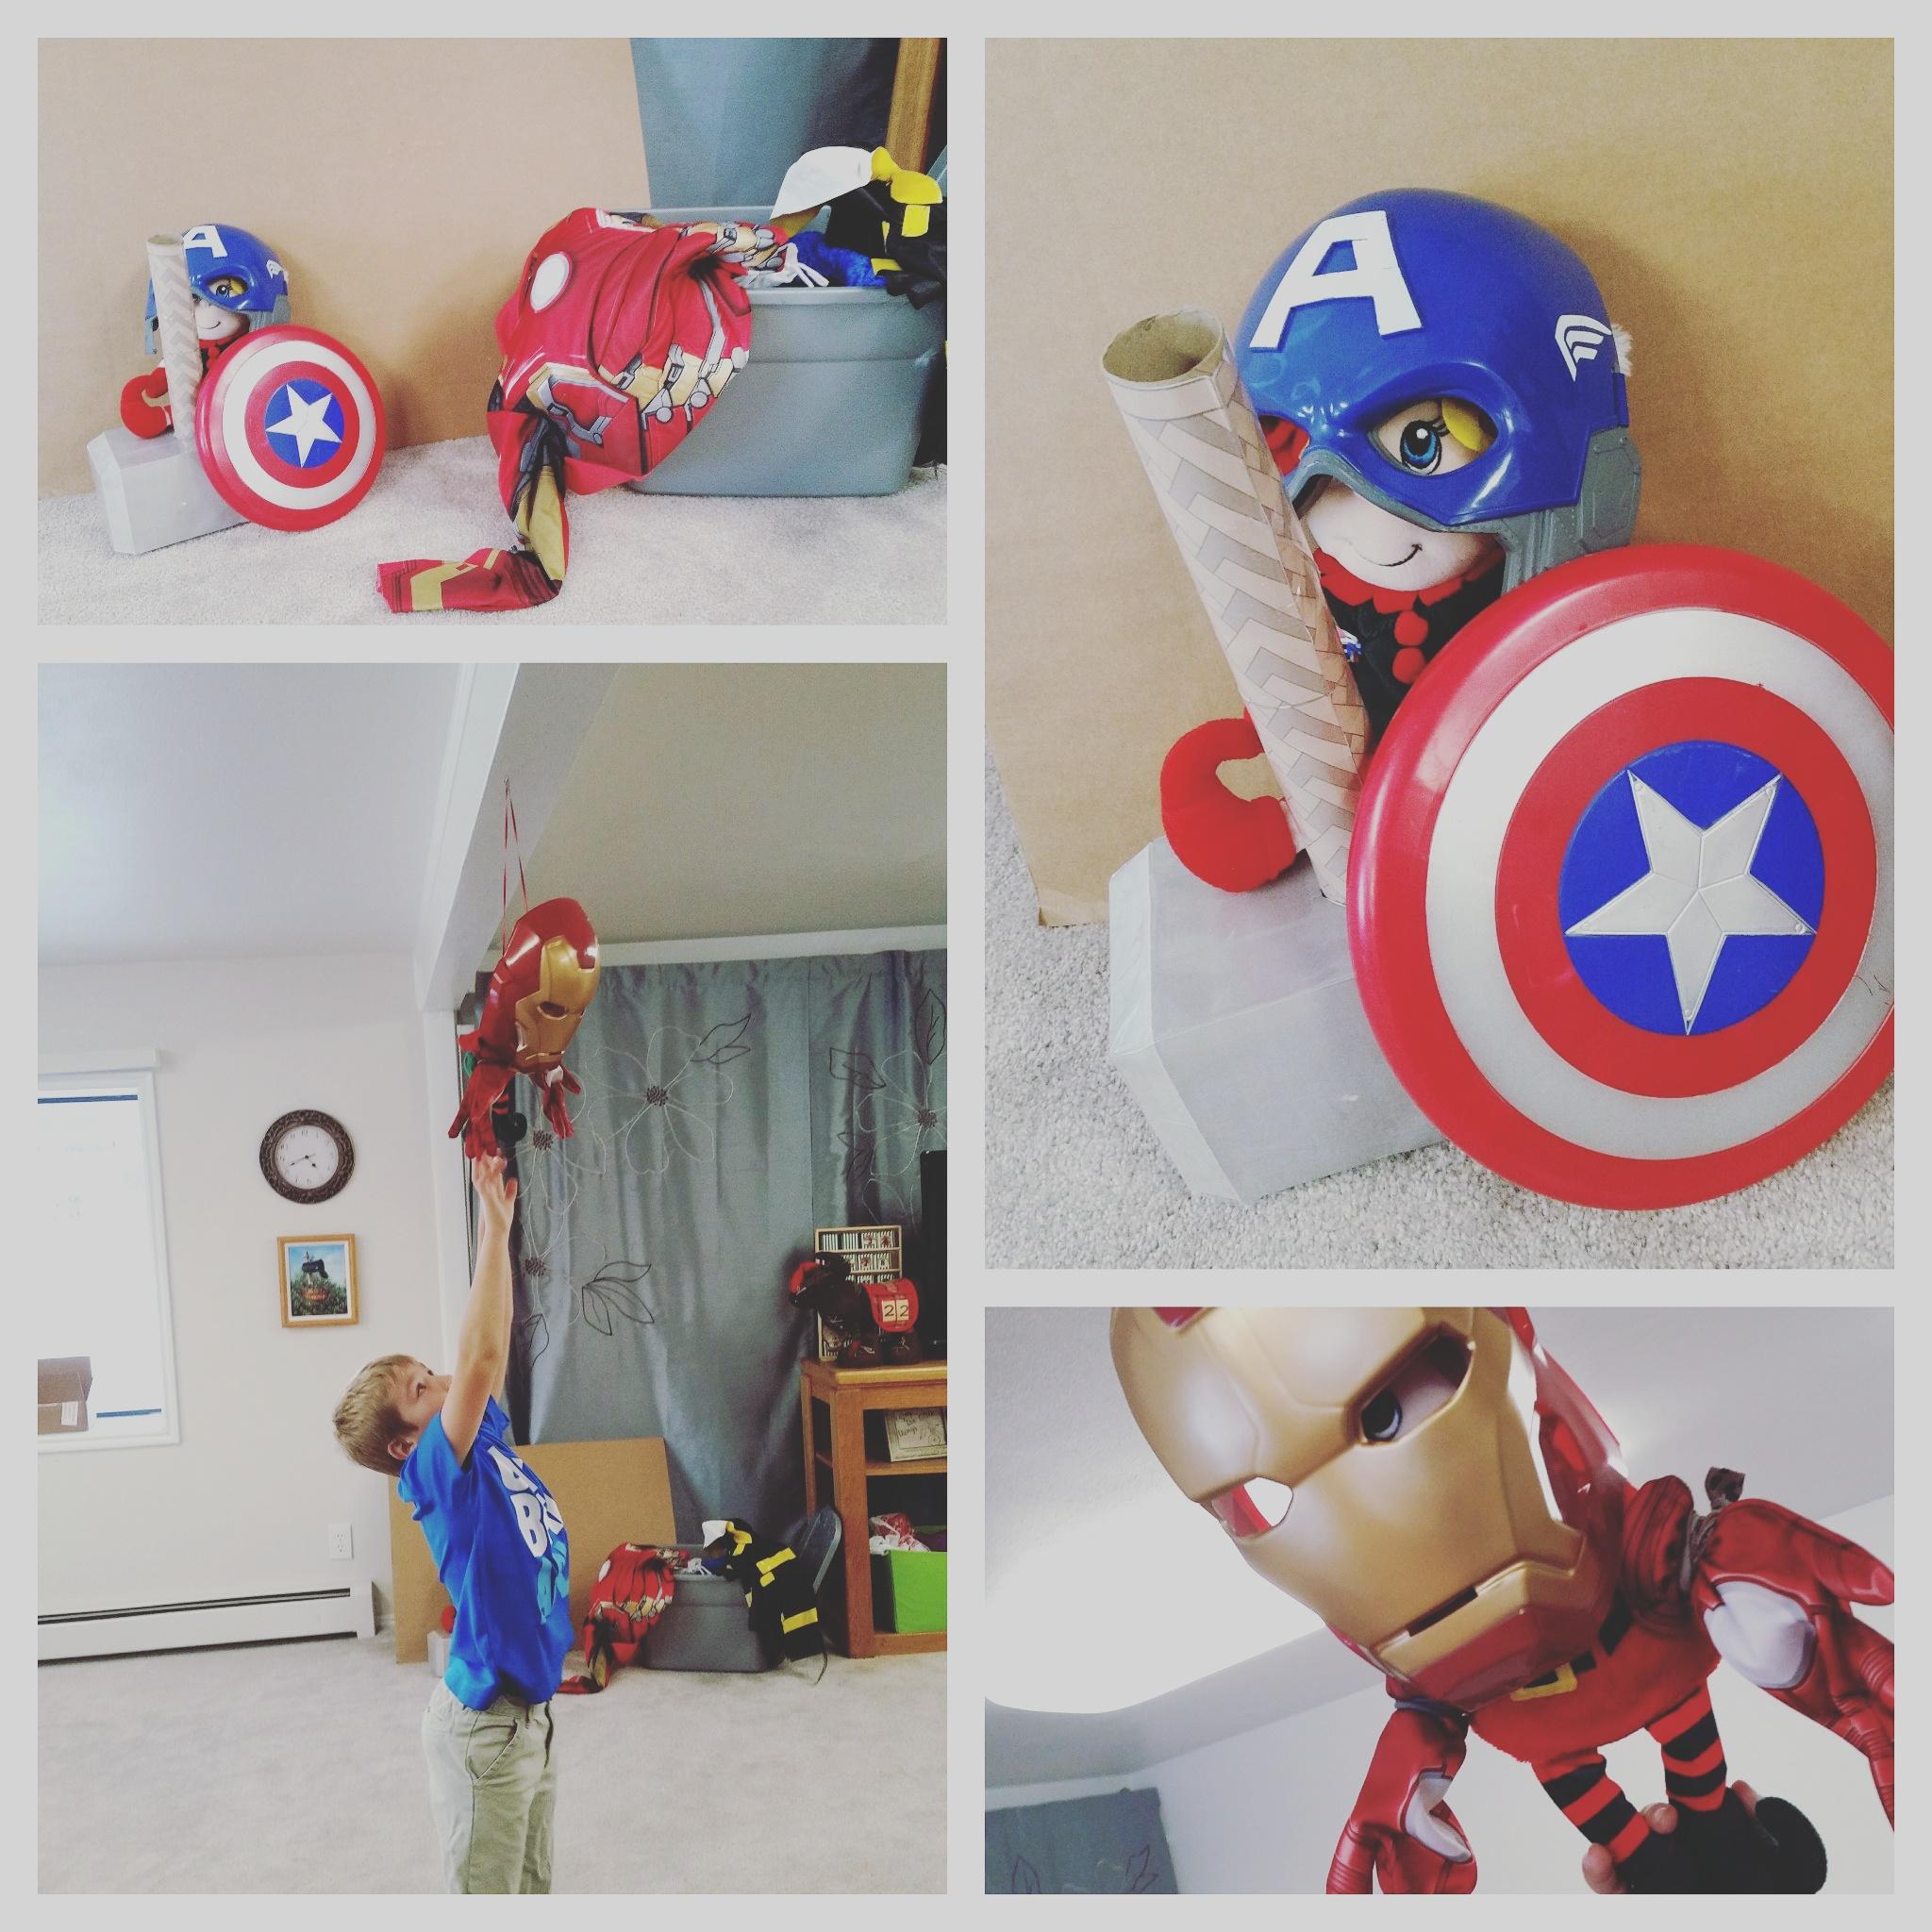 Christmas Elf Elf on the Shelf Antique Super Hero Elf dressed up as Iron Man and Captain America